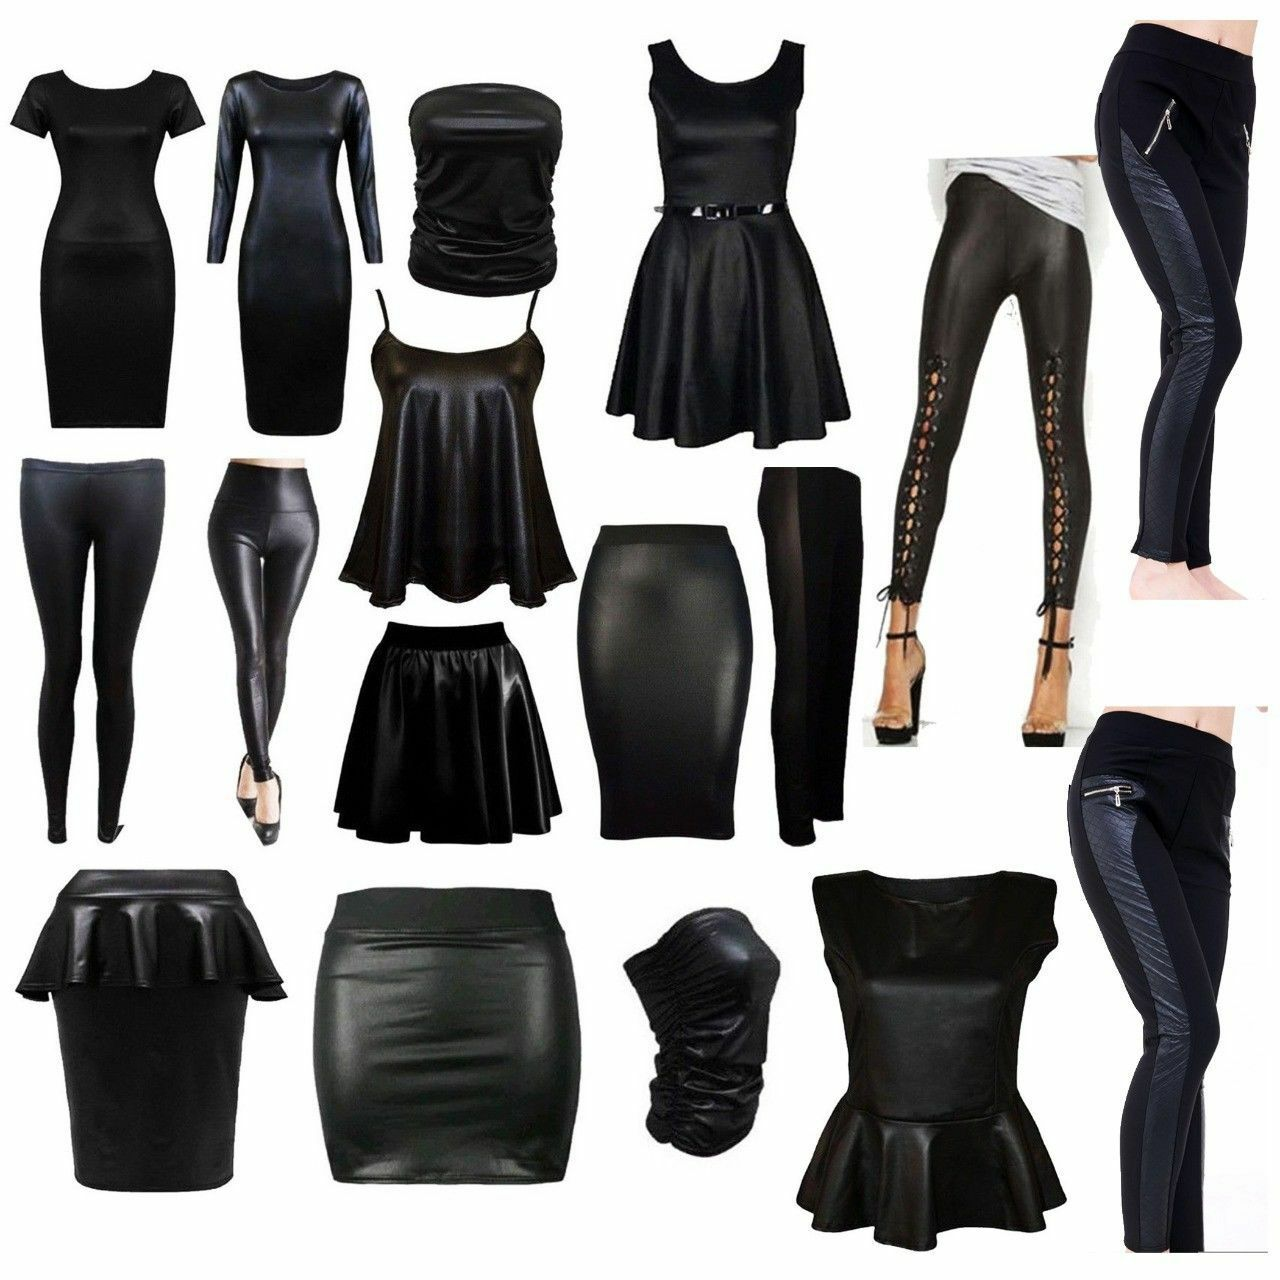 Women/'s High Waist Wet Look Midi Skirt PU Leather Stretchy Pencil Bodycon Dress